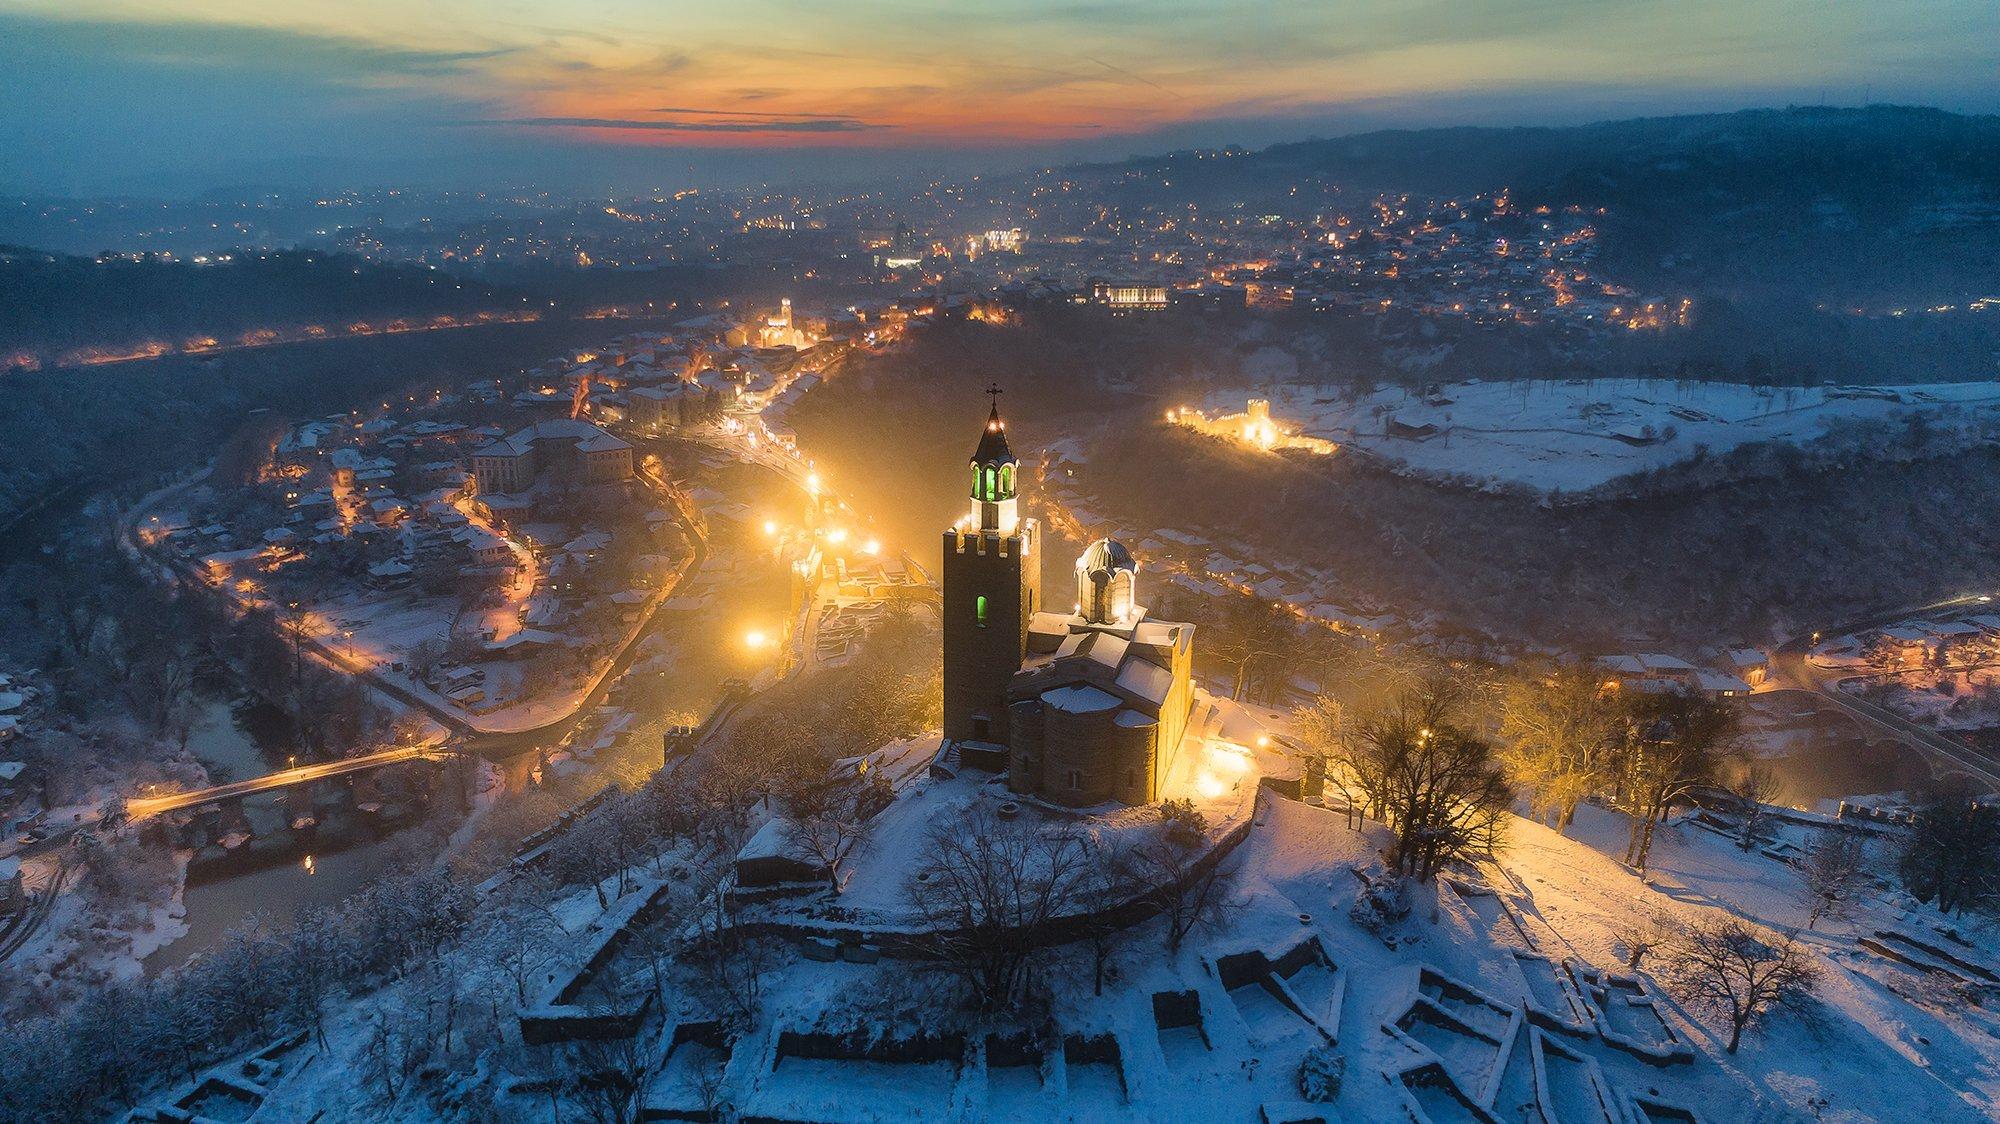 sunset, carevec, winter, night, lights, bulgaria, veliko tarnovo, drone, aerial view, Даниел Балъков